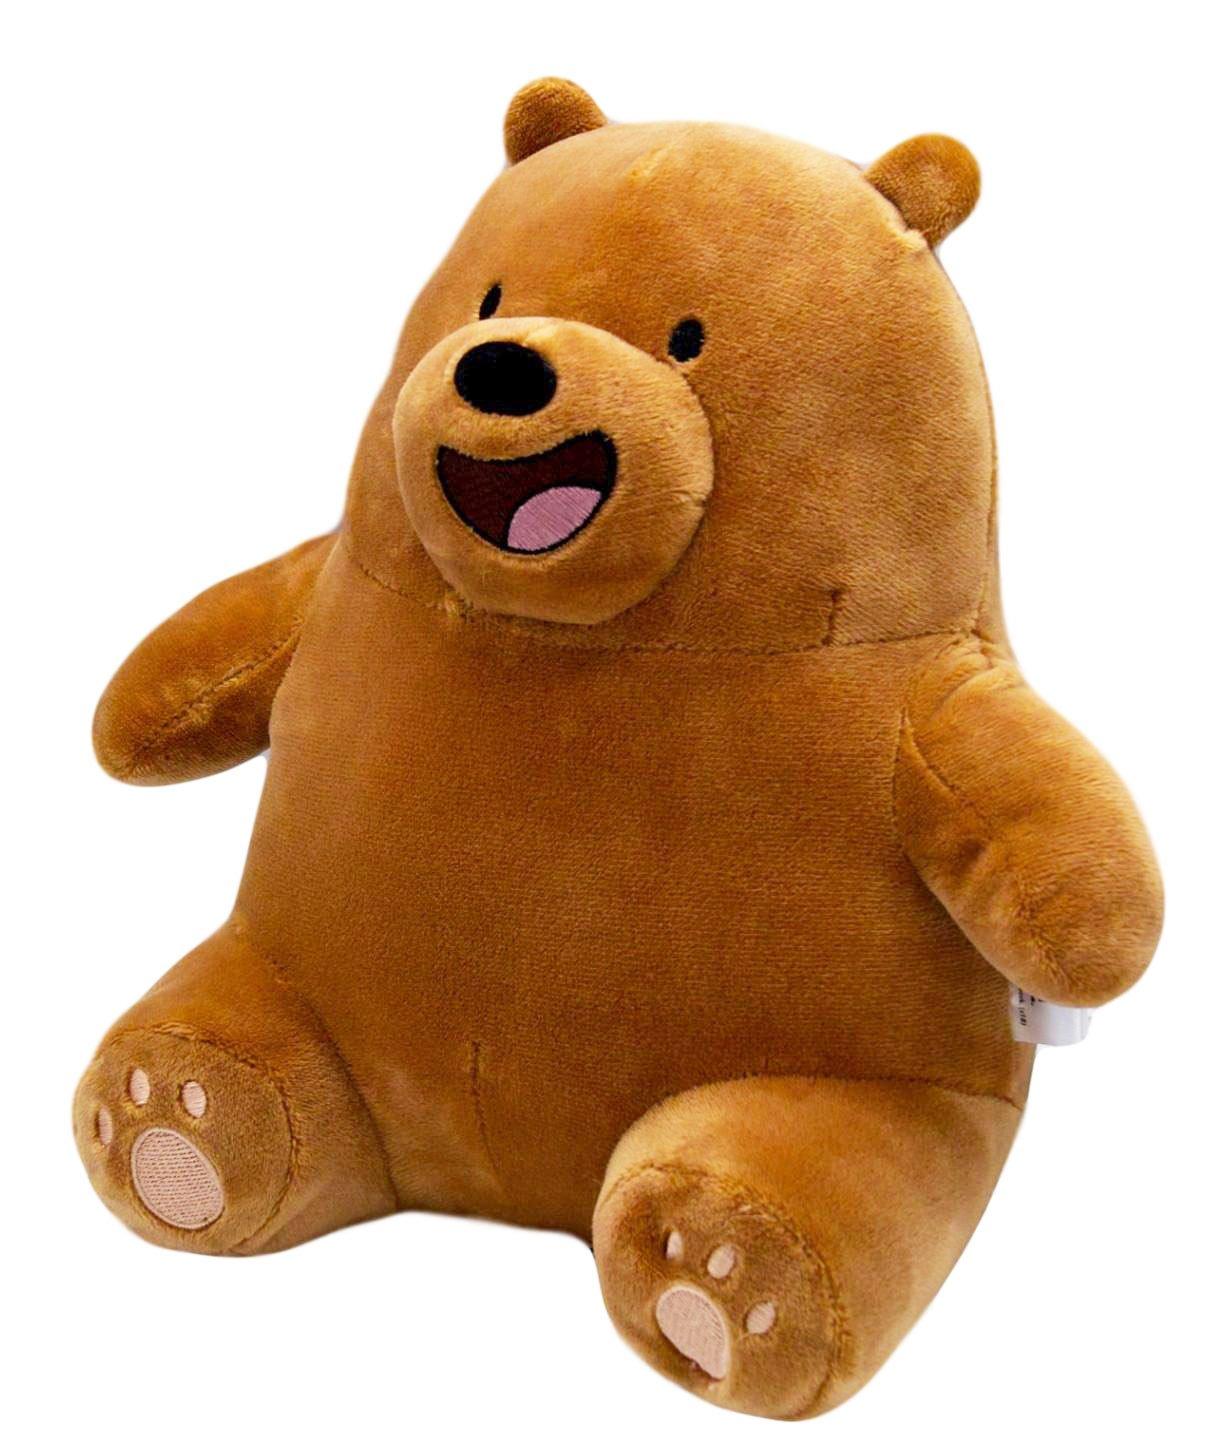 Cartoon Character Stuffed Animal We Bare Bears Grizz Sitting Teddy Bear Gift